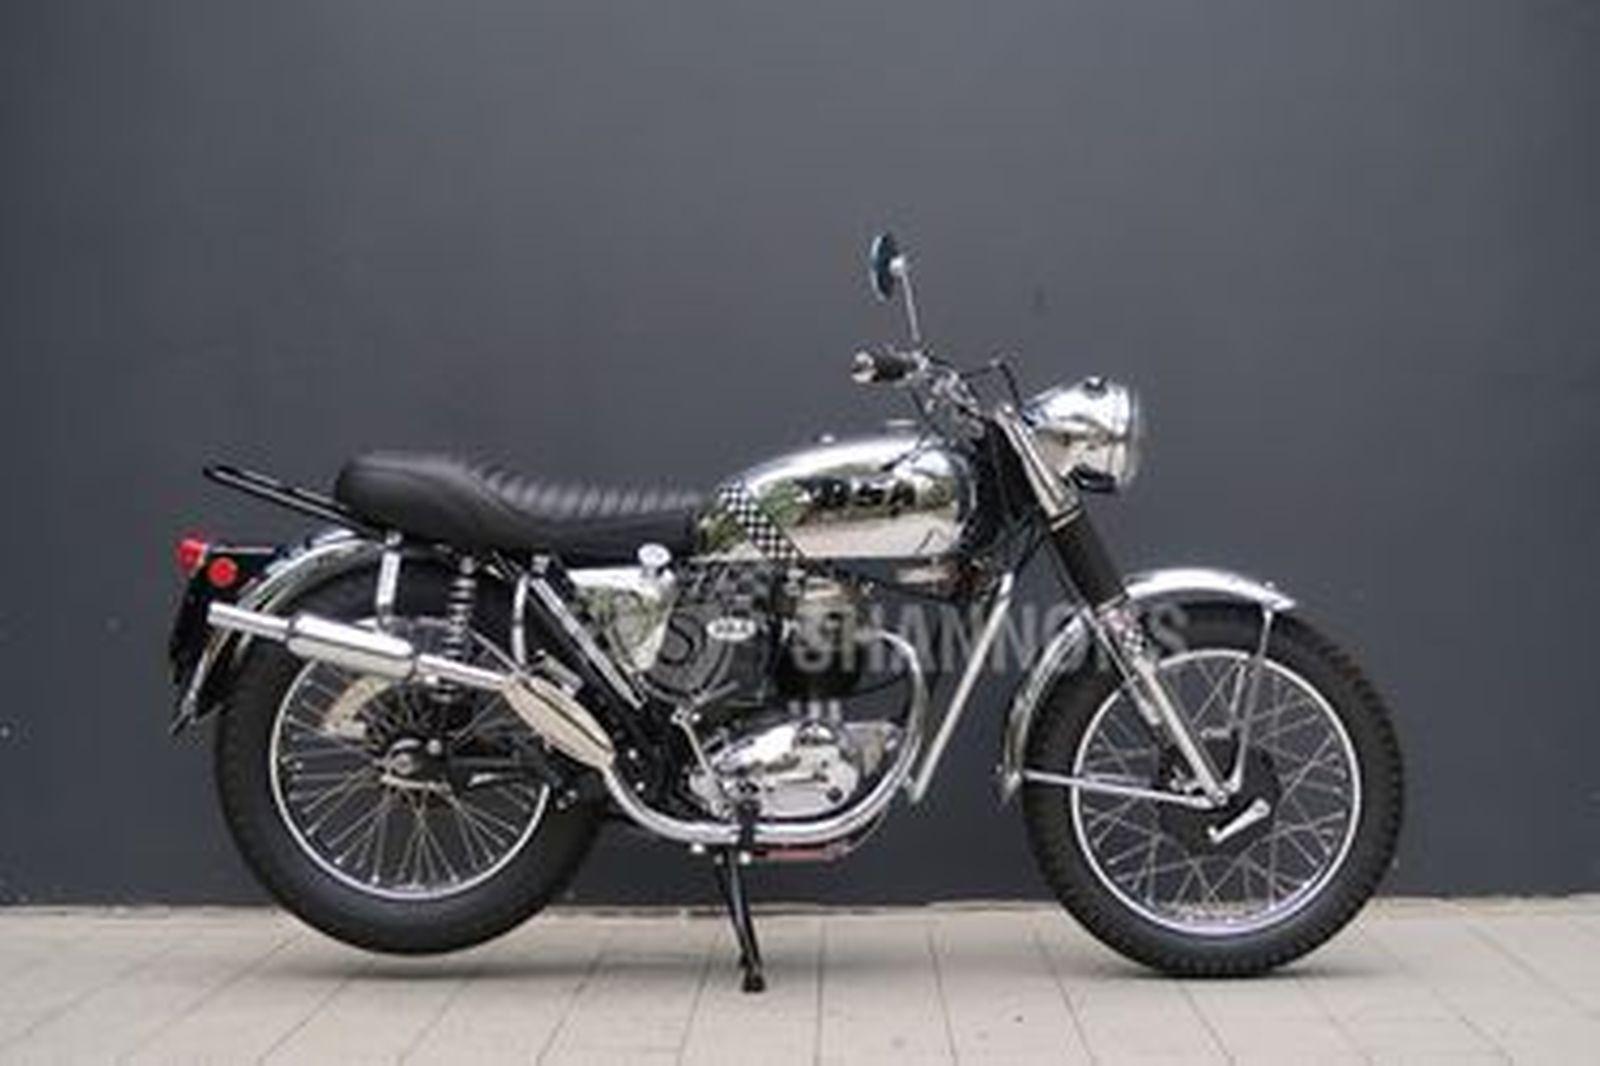 BSA AWD B40 350cc Motorcycle